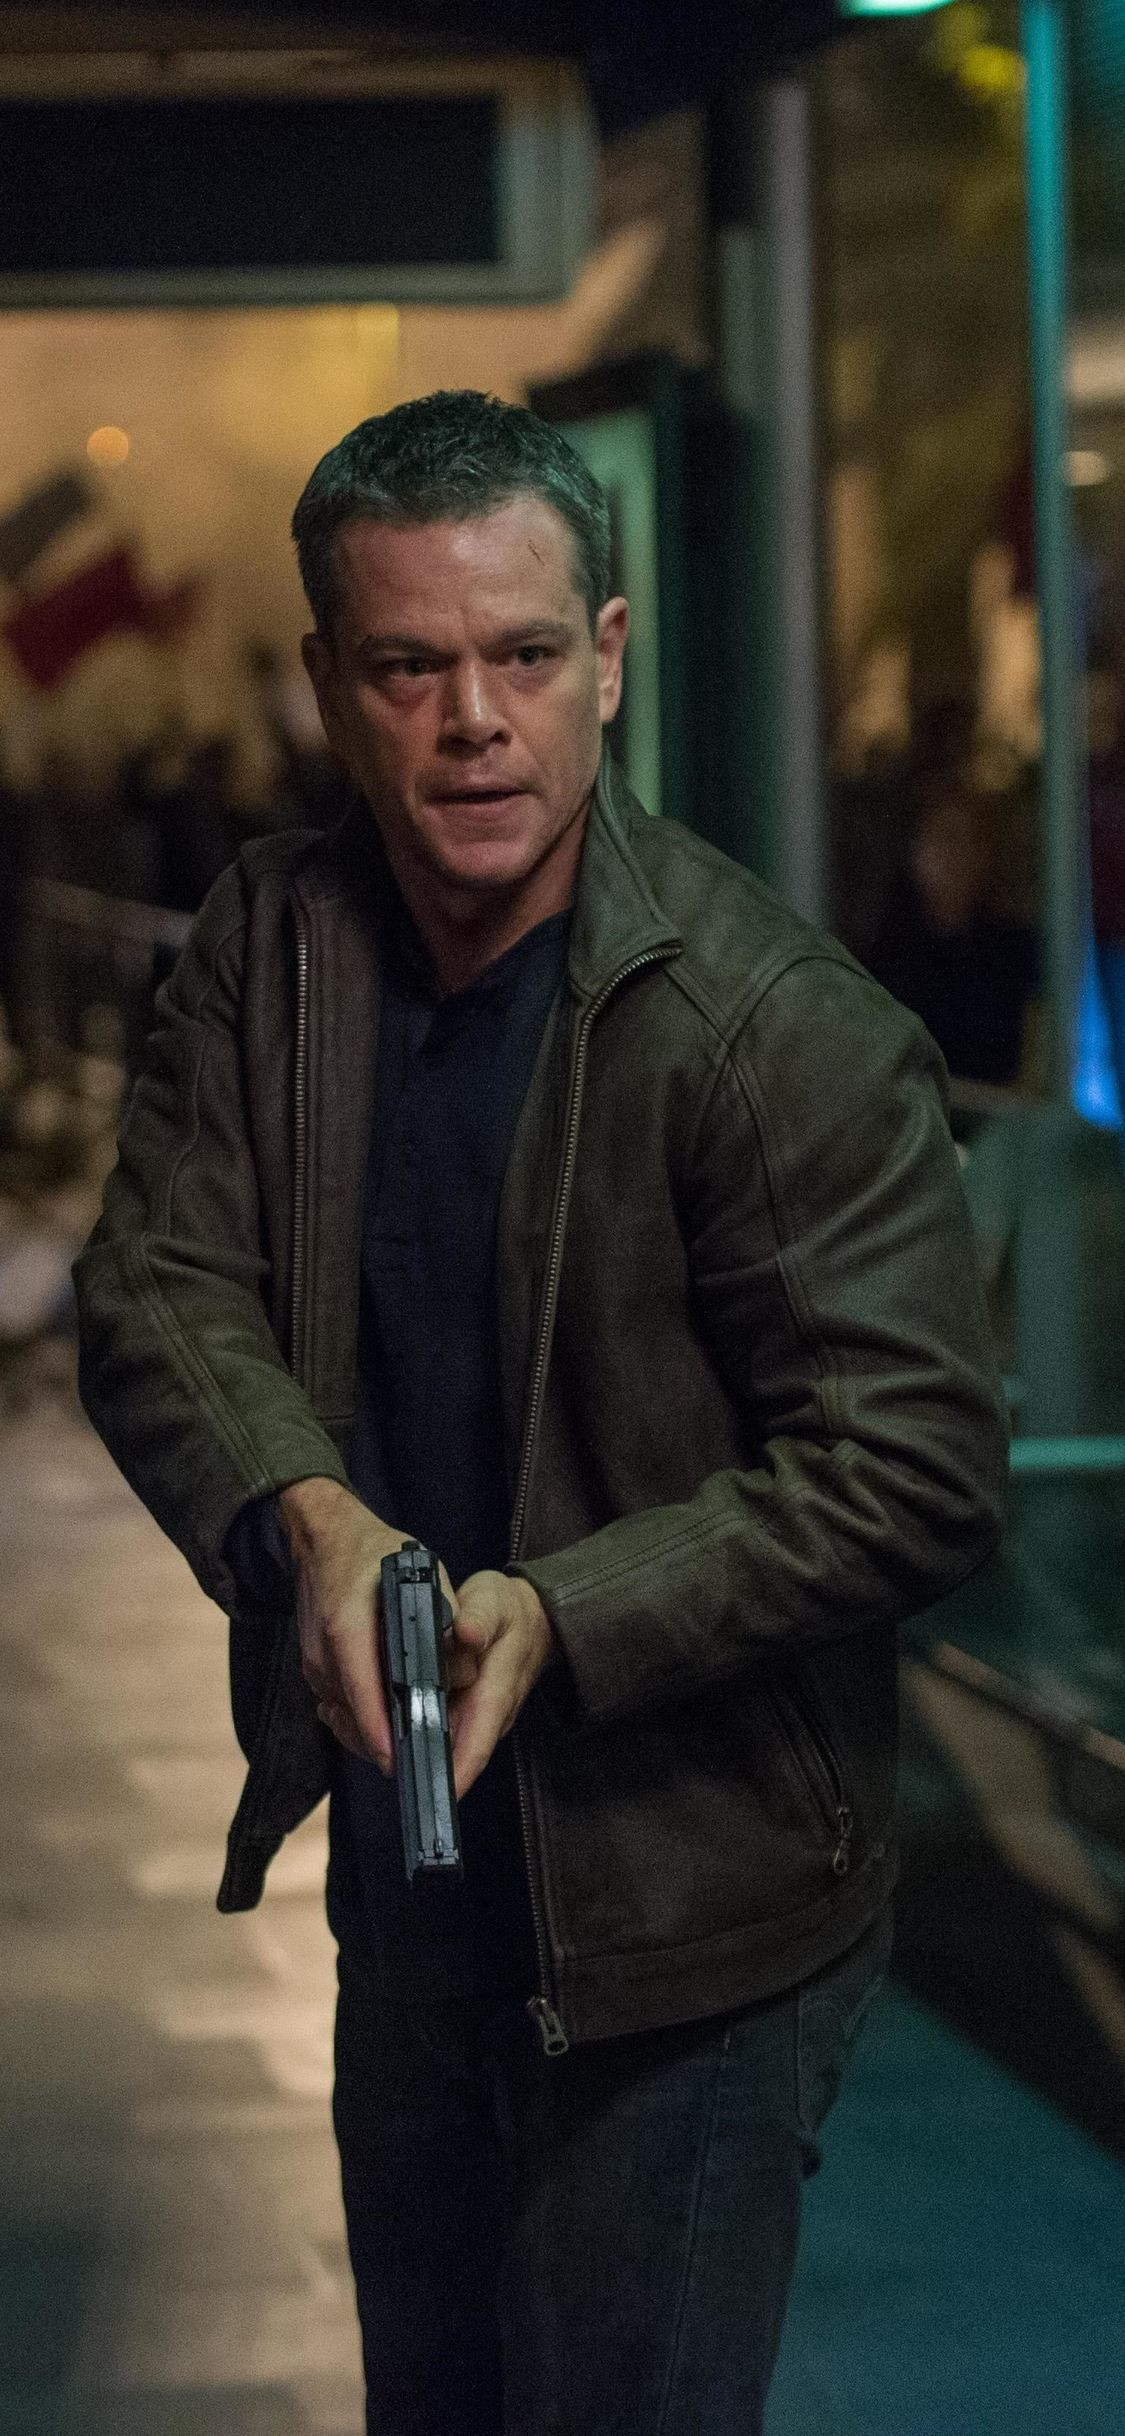 Res: 1125x2436, Matt Damon In Jason Bourne (Iphone XS,Iphone 10,Iphone X)